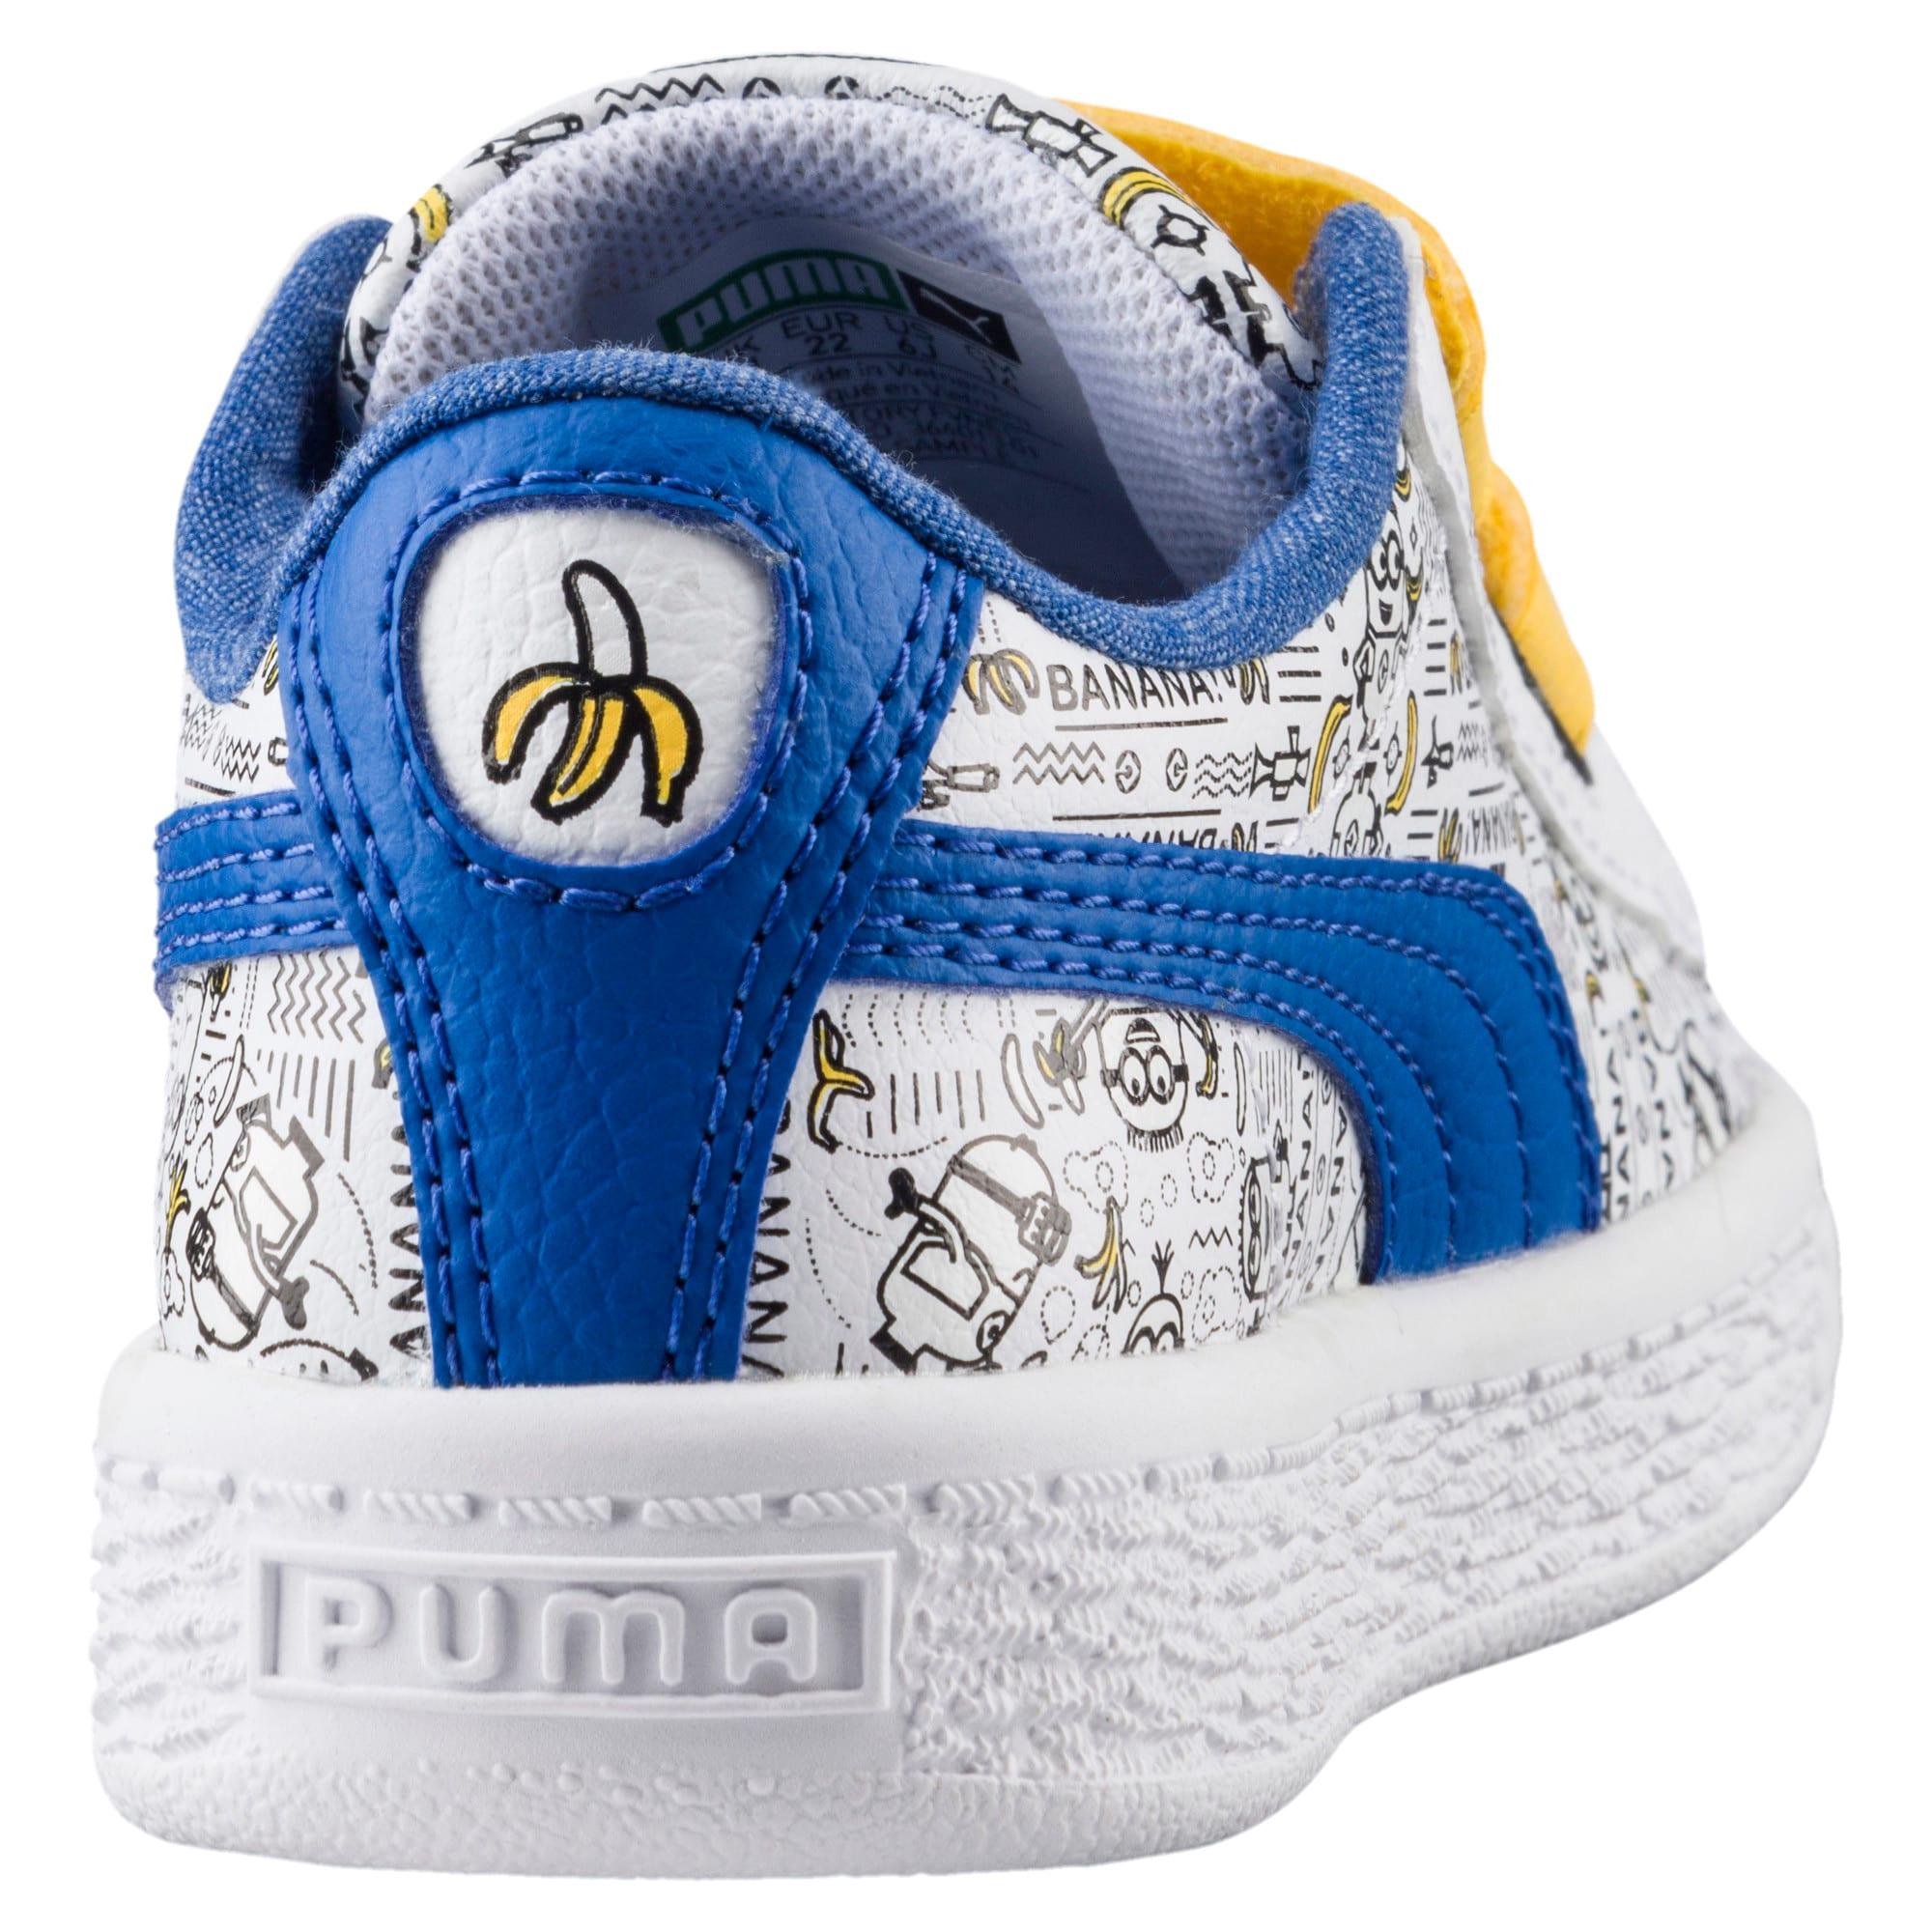 Thumbnail 4 of Minions Basket Little Kids' Shoes, Puma White-Lapis Blue, medium